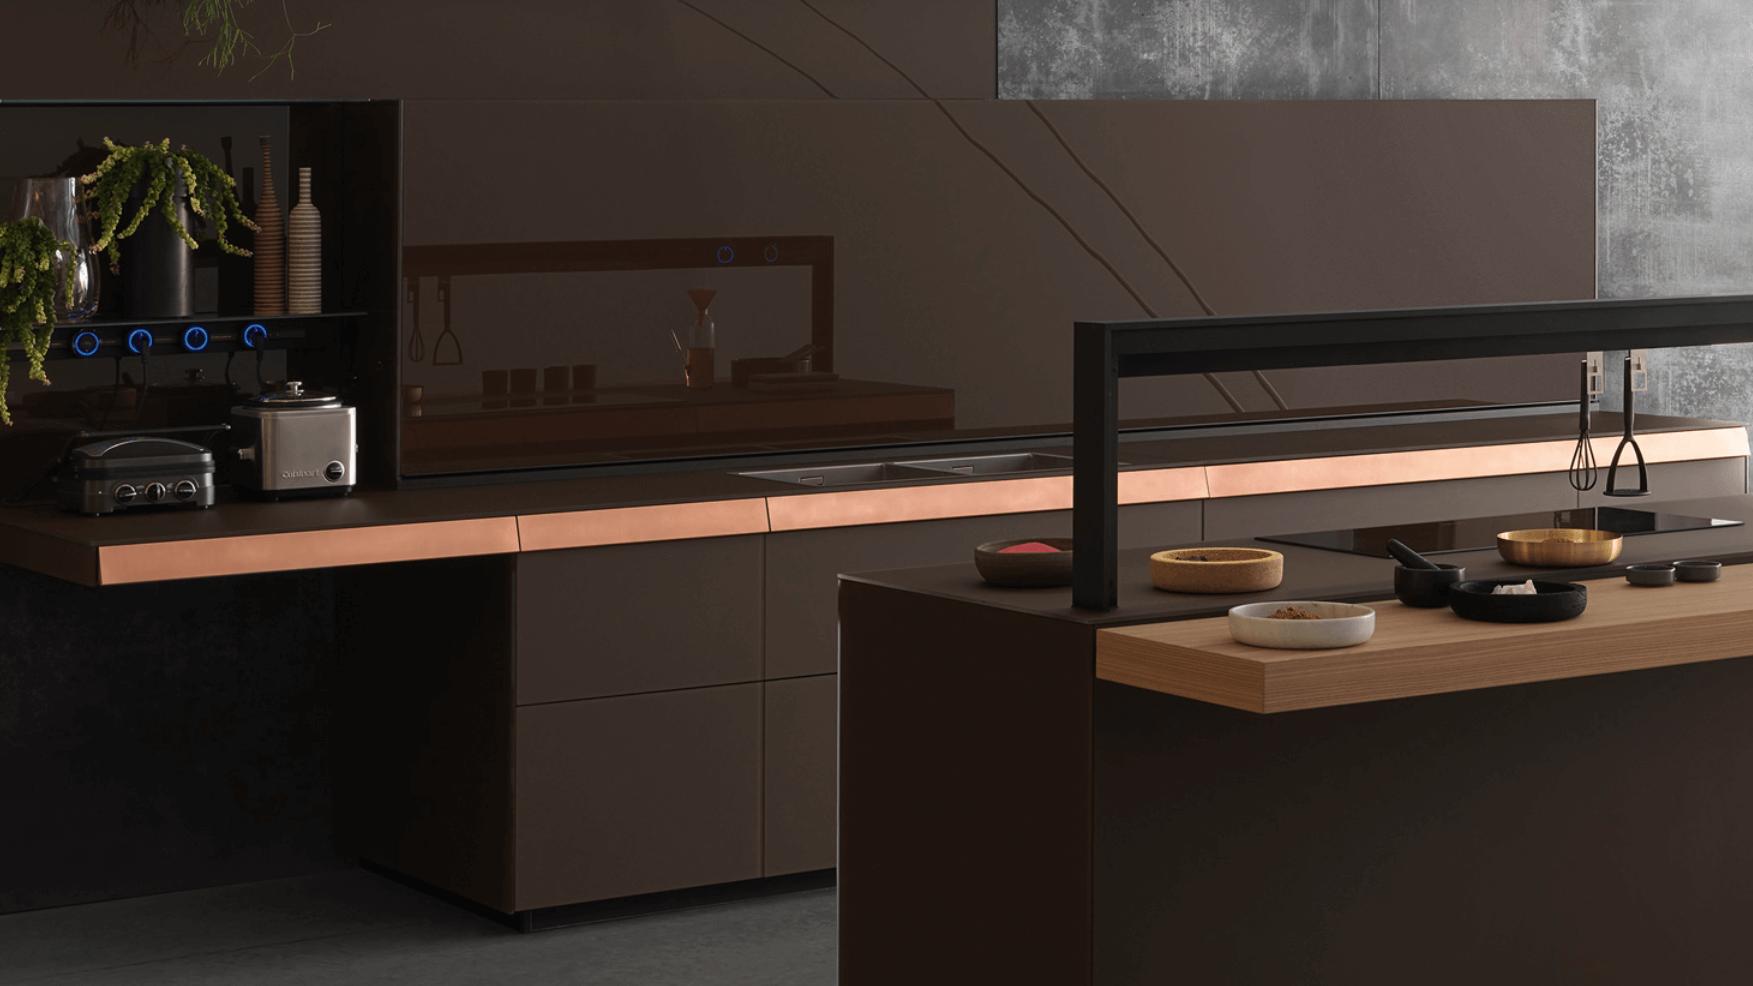 Cucina Valcucine - Devincenti negozio arredamento Verona